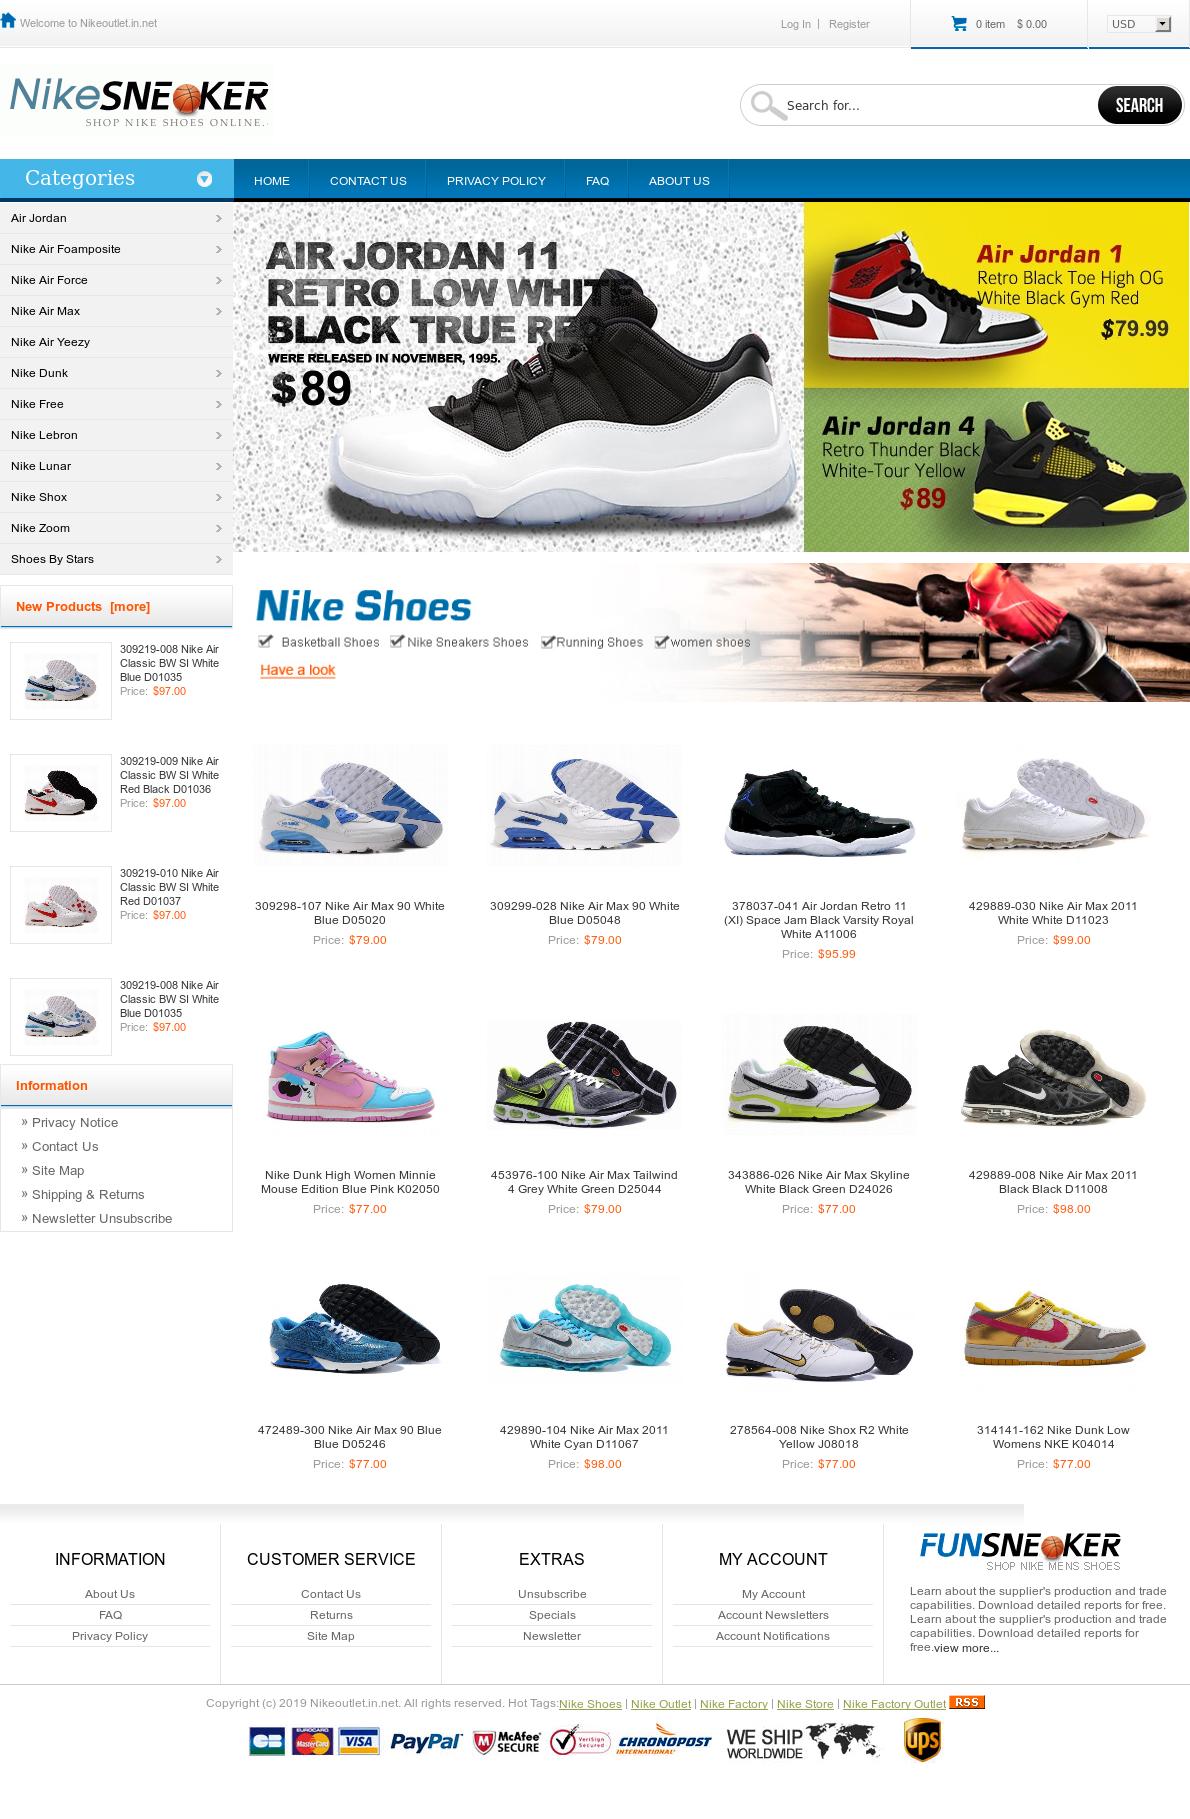 e7cb9cdacca4 Nikeoutlet Competitors